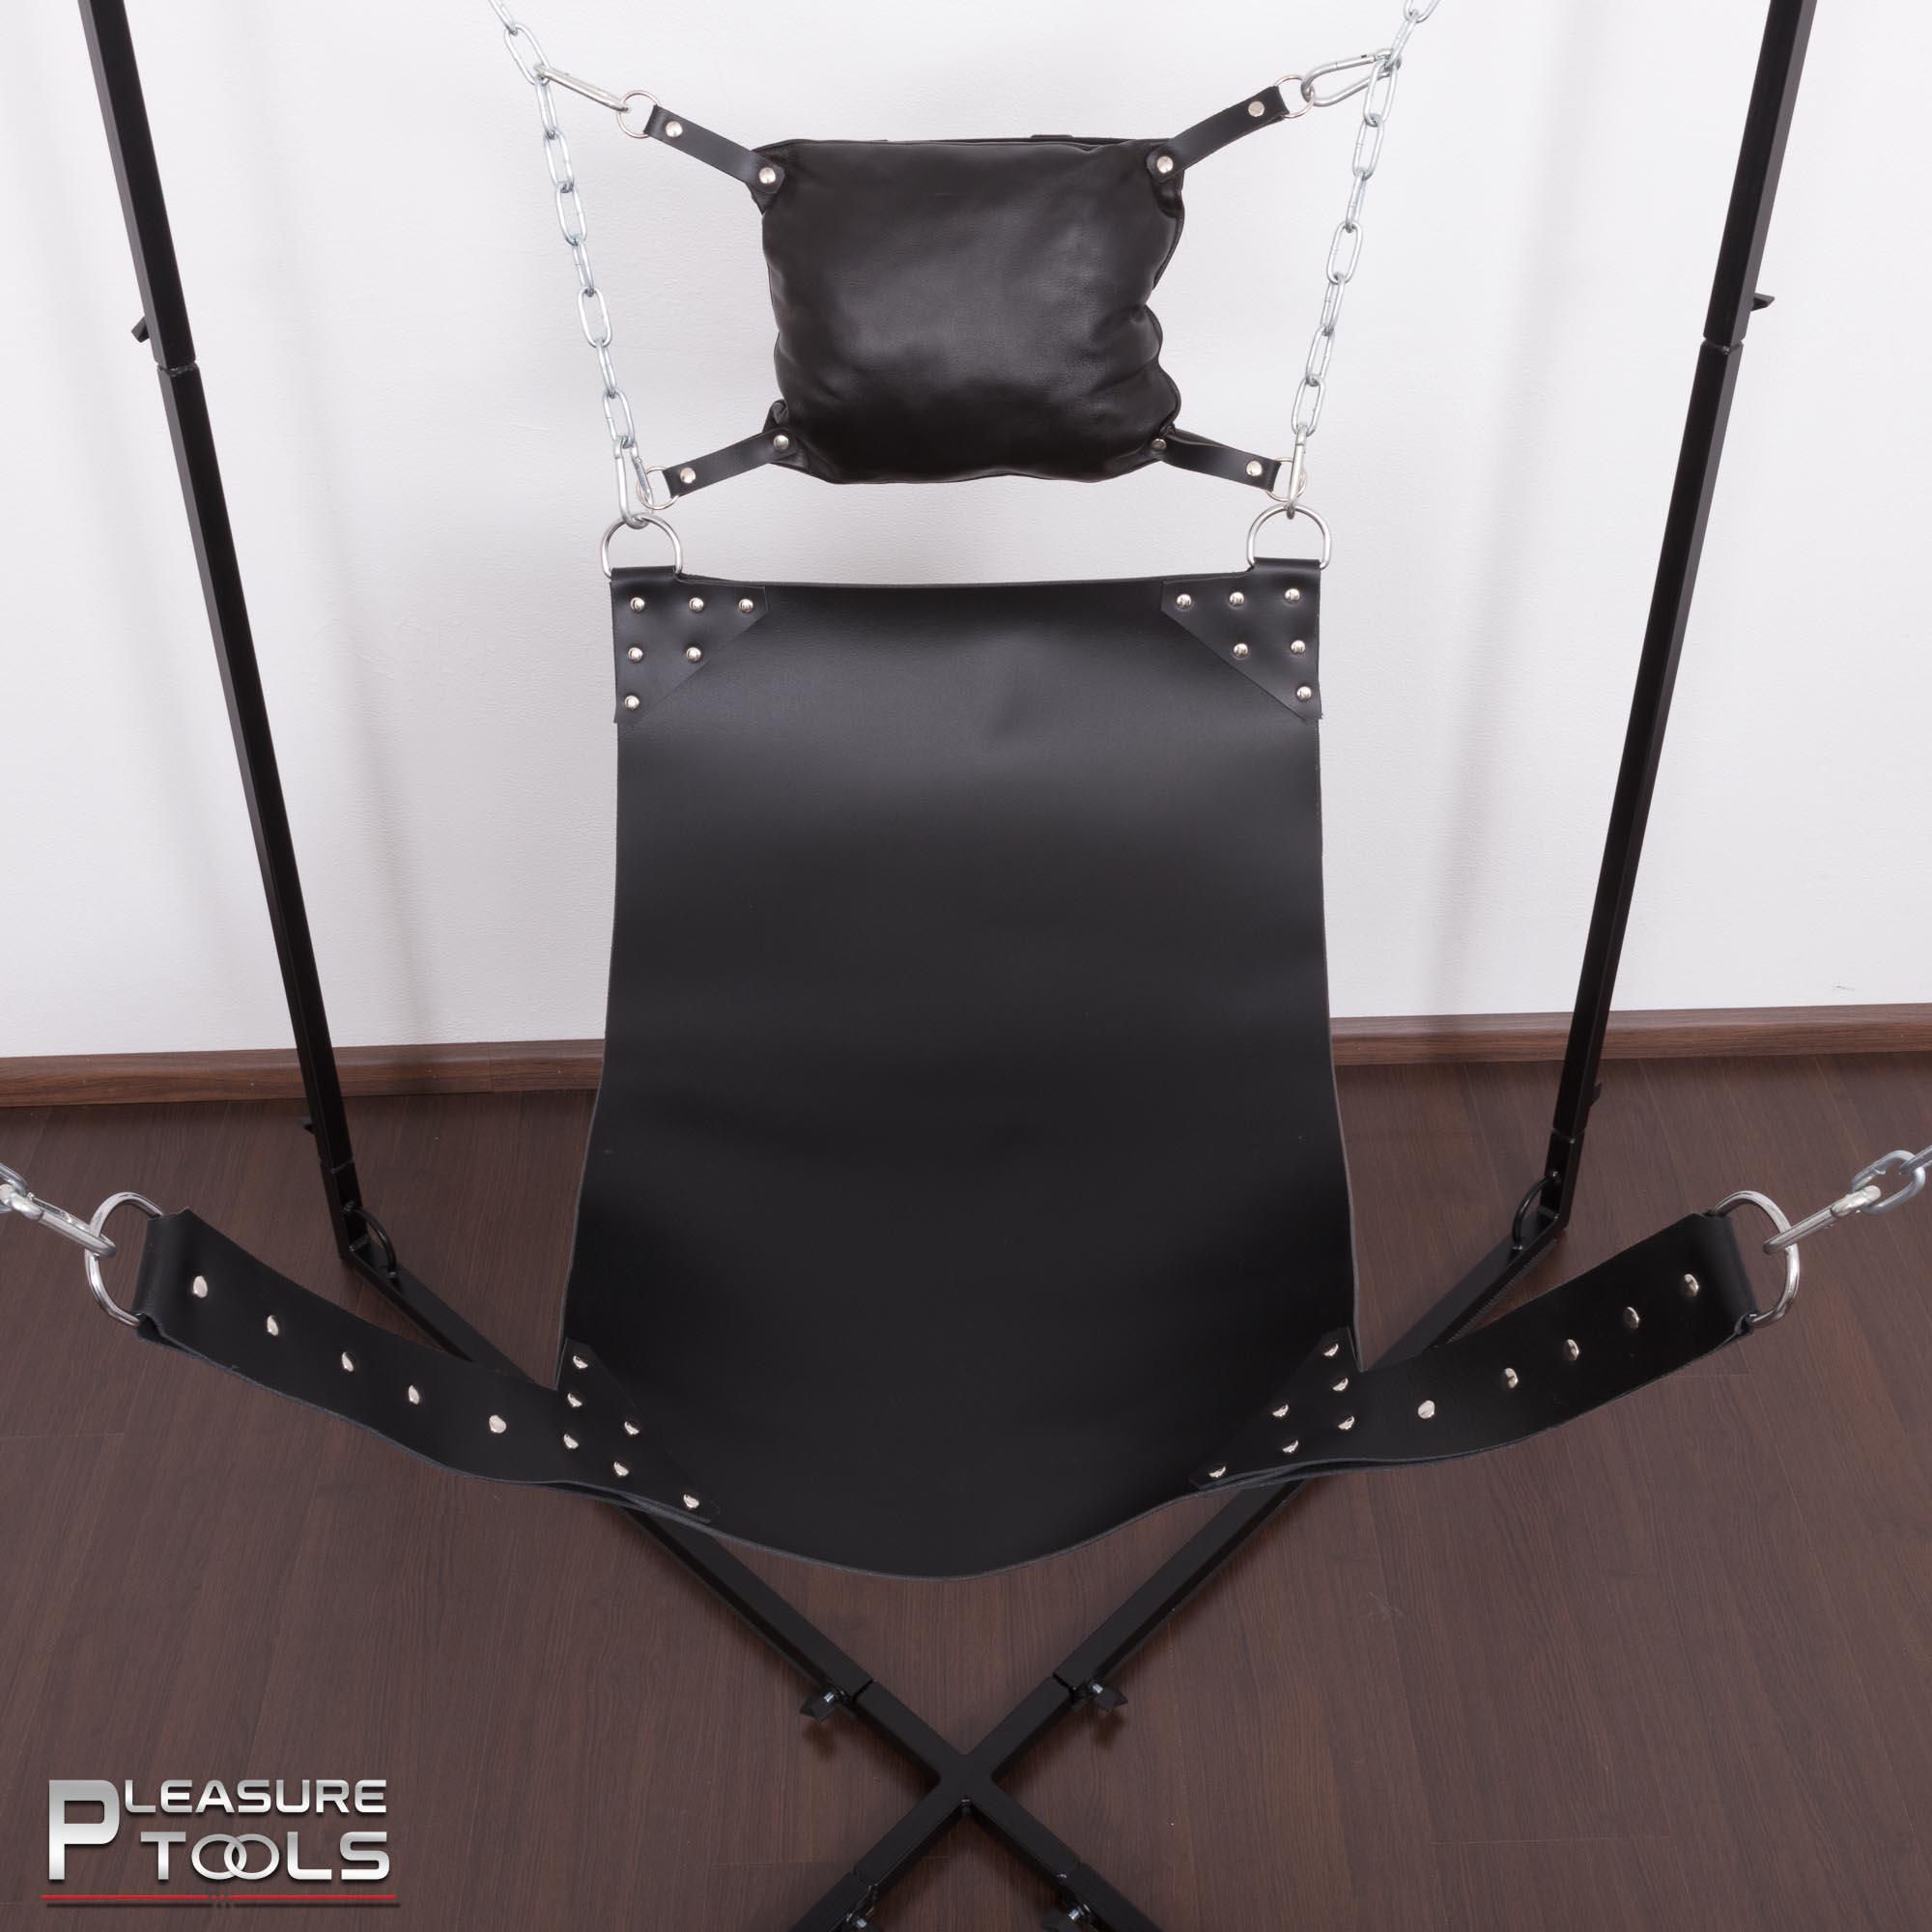 Pleasure Tools 4-punts sling met kussen